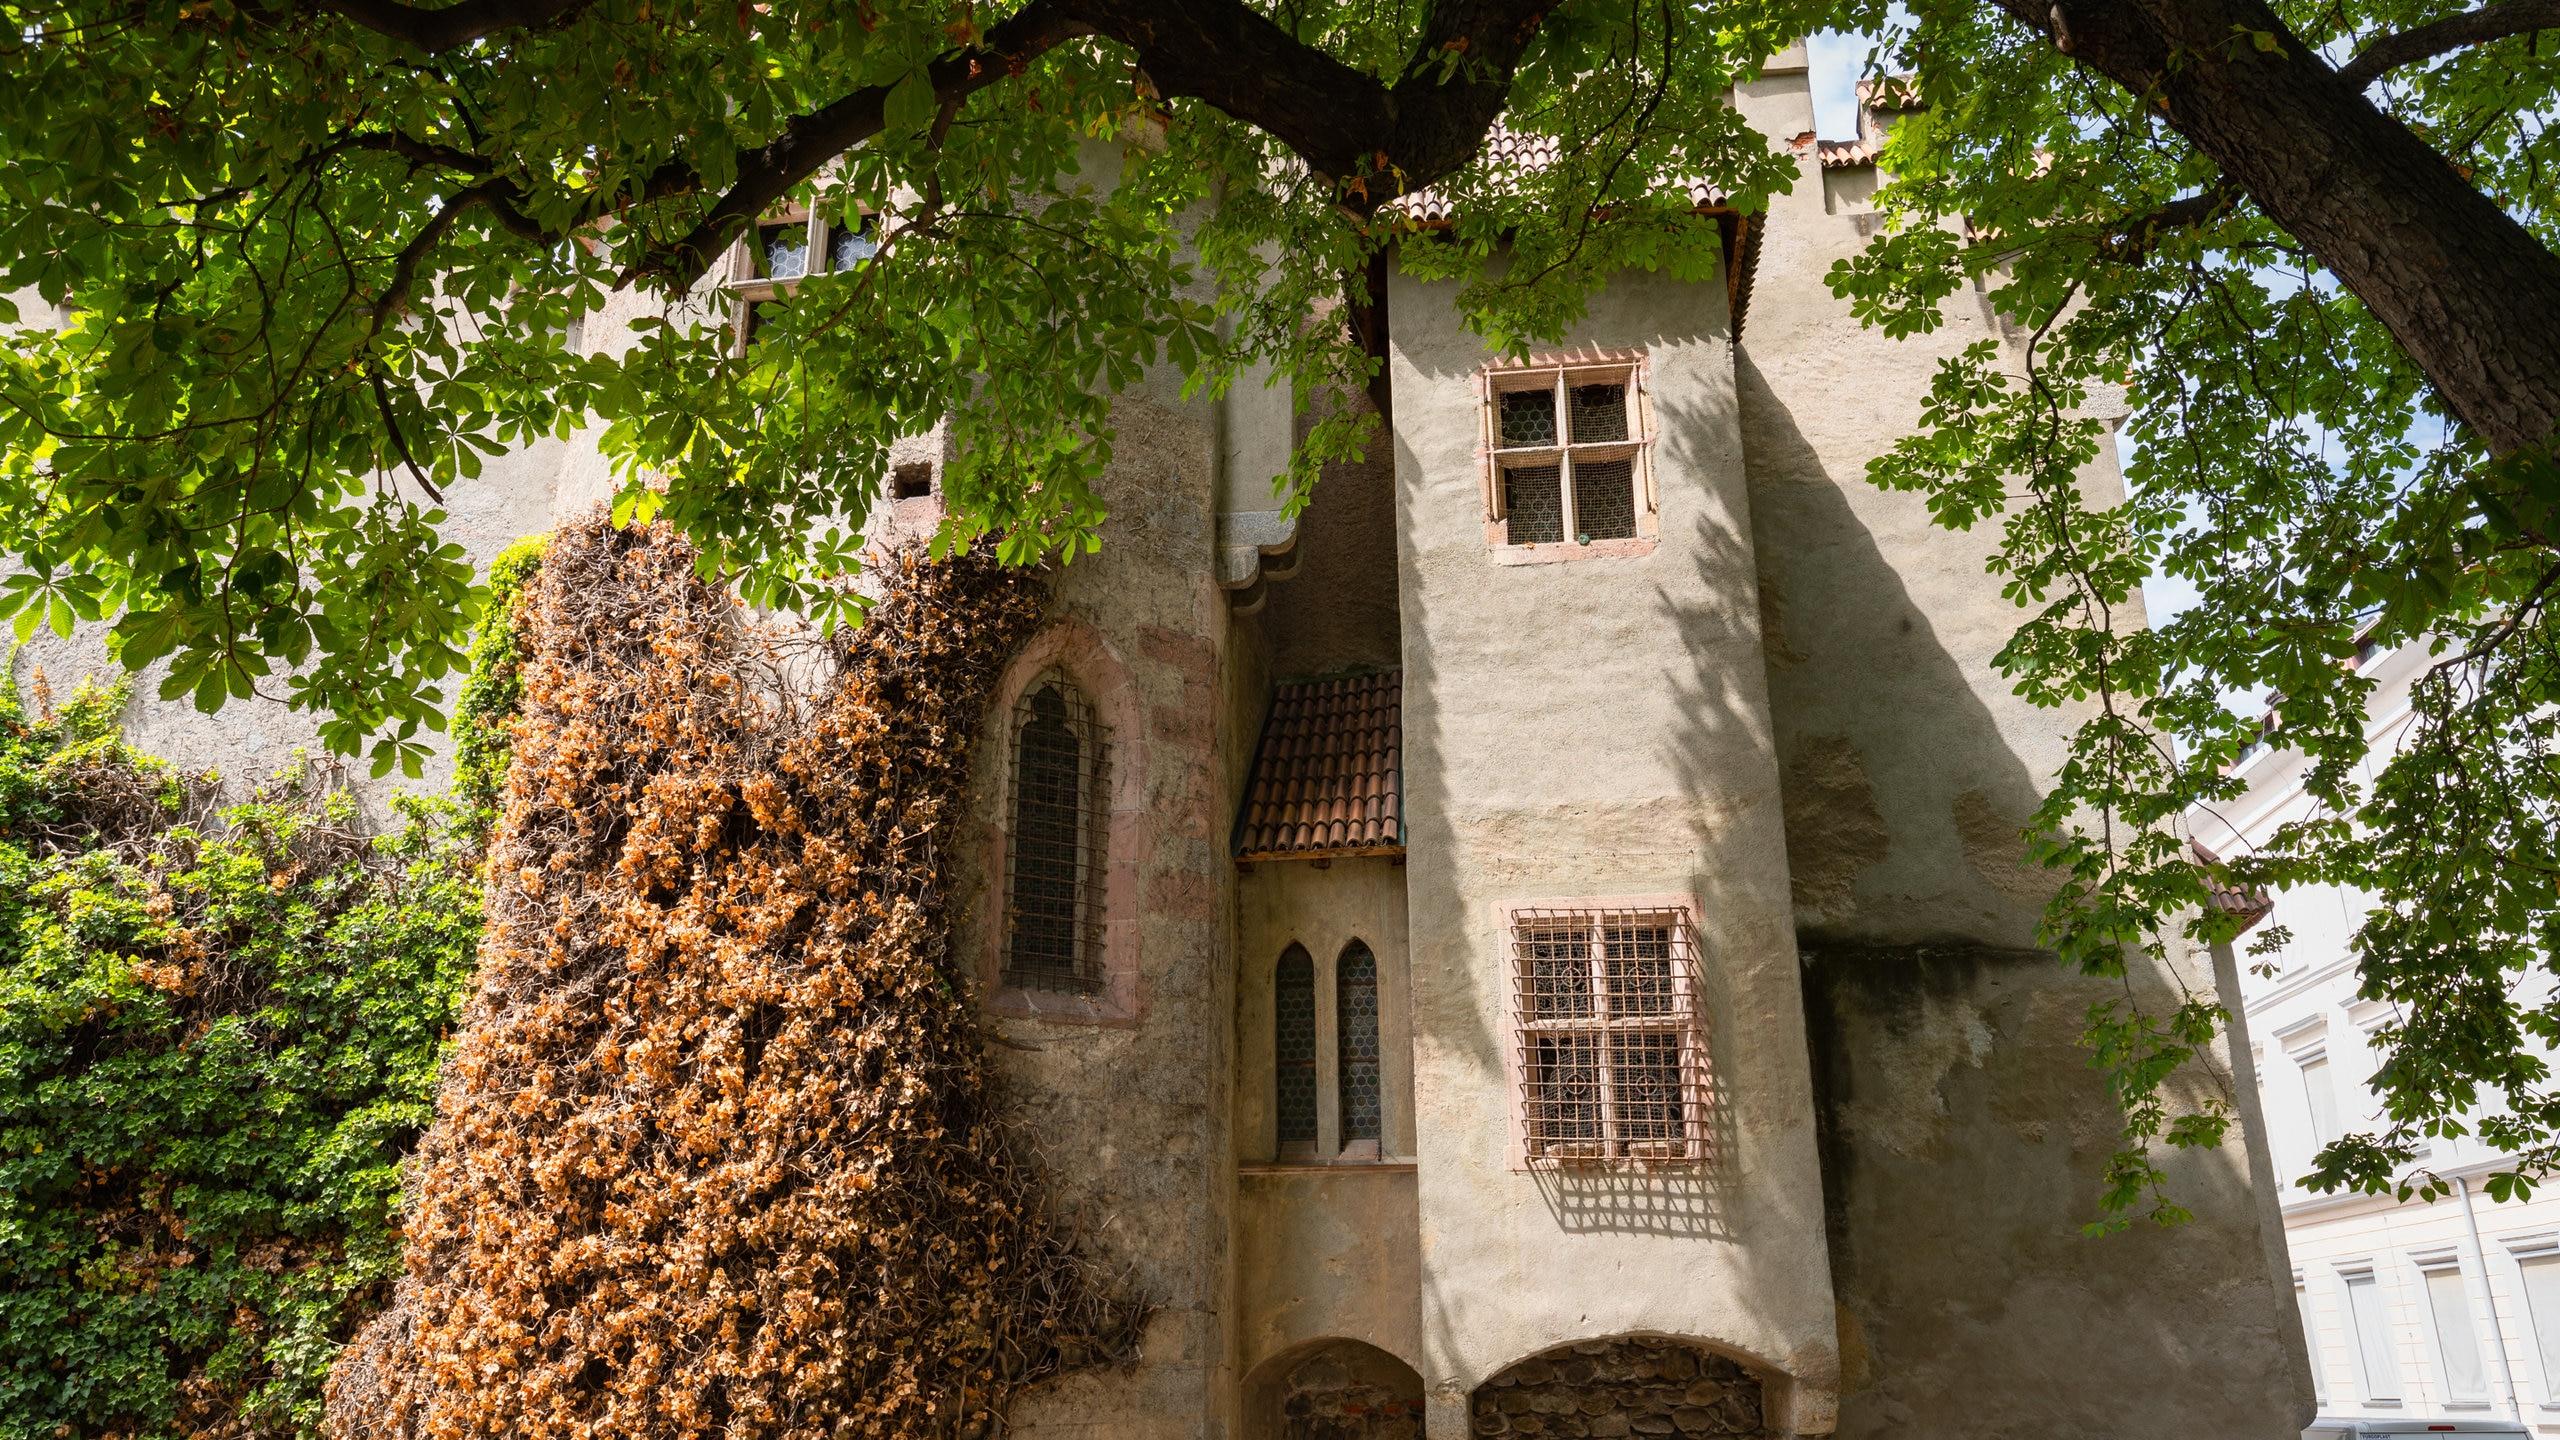 Prince's Castle, Merano, Trentino-Alto Adige, Italy